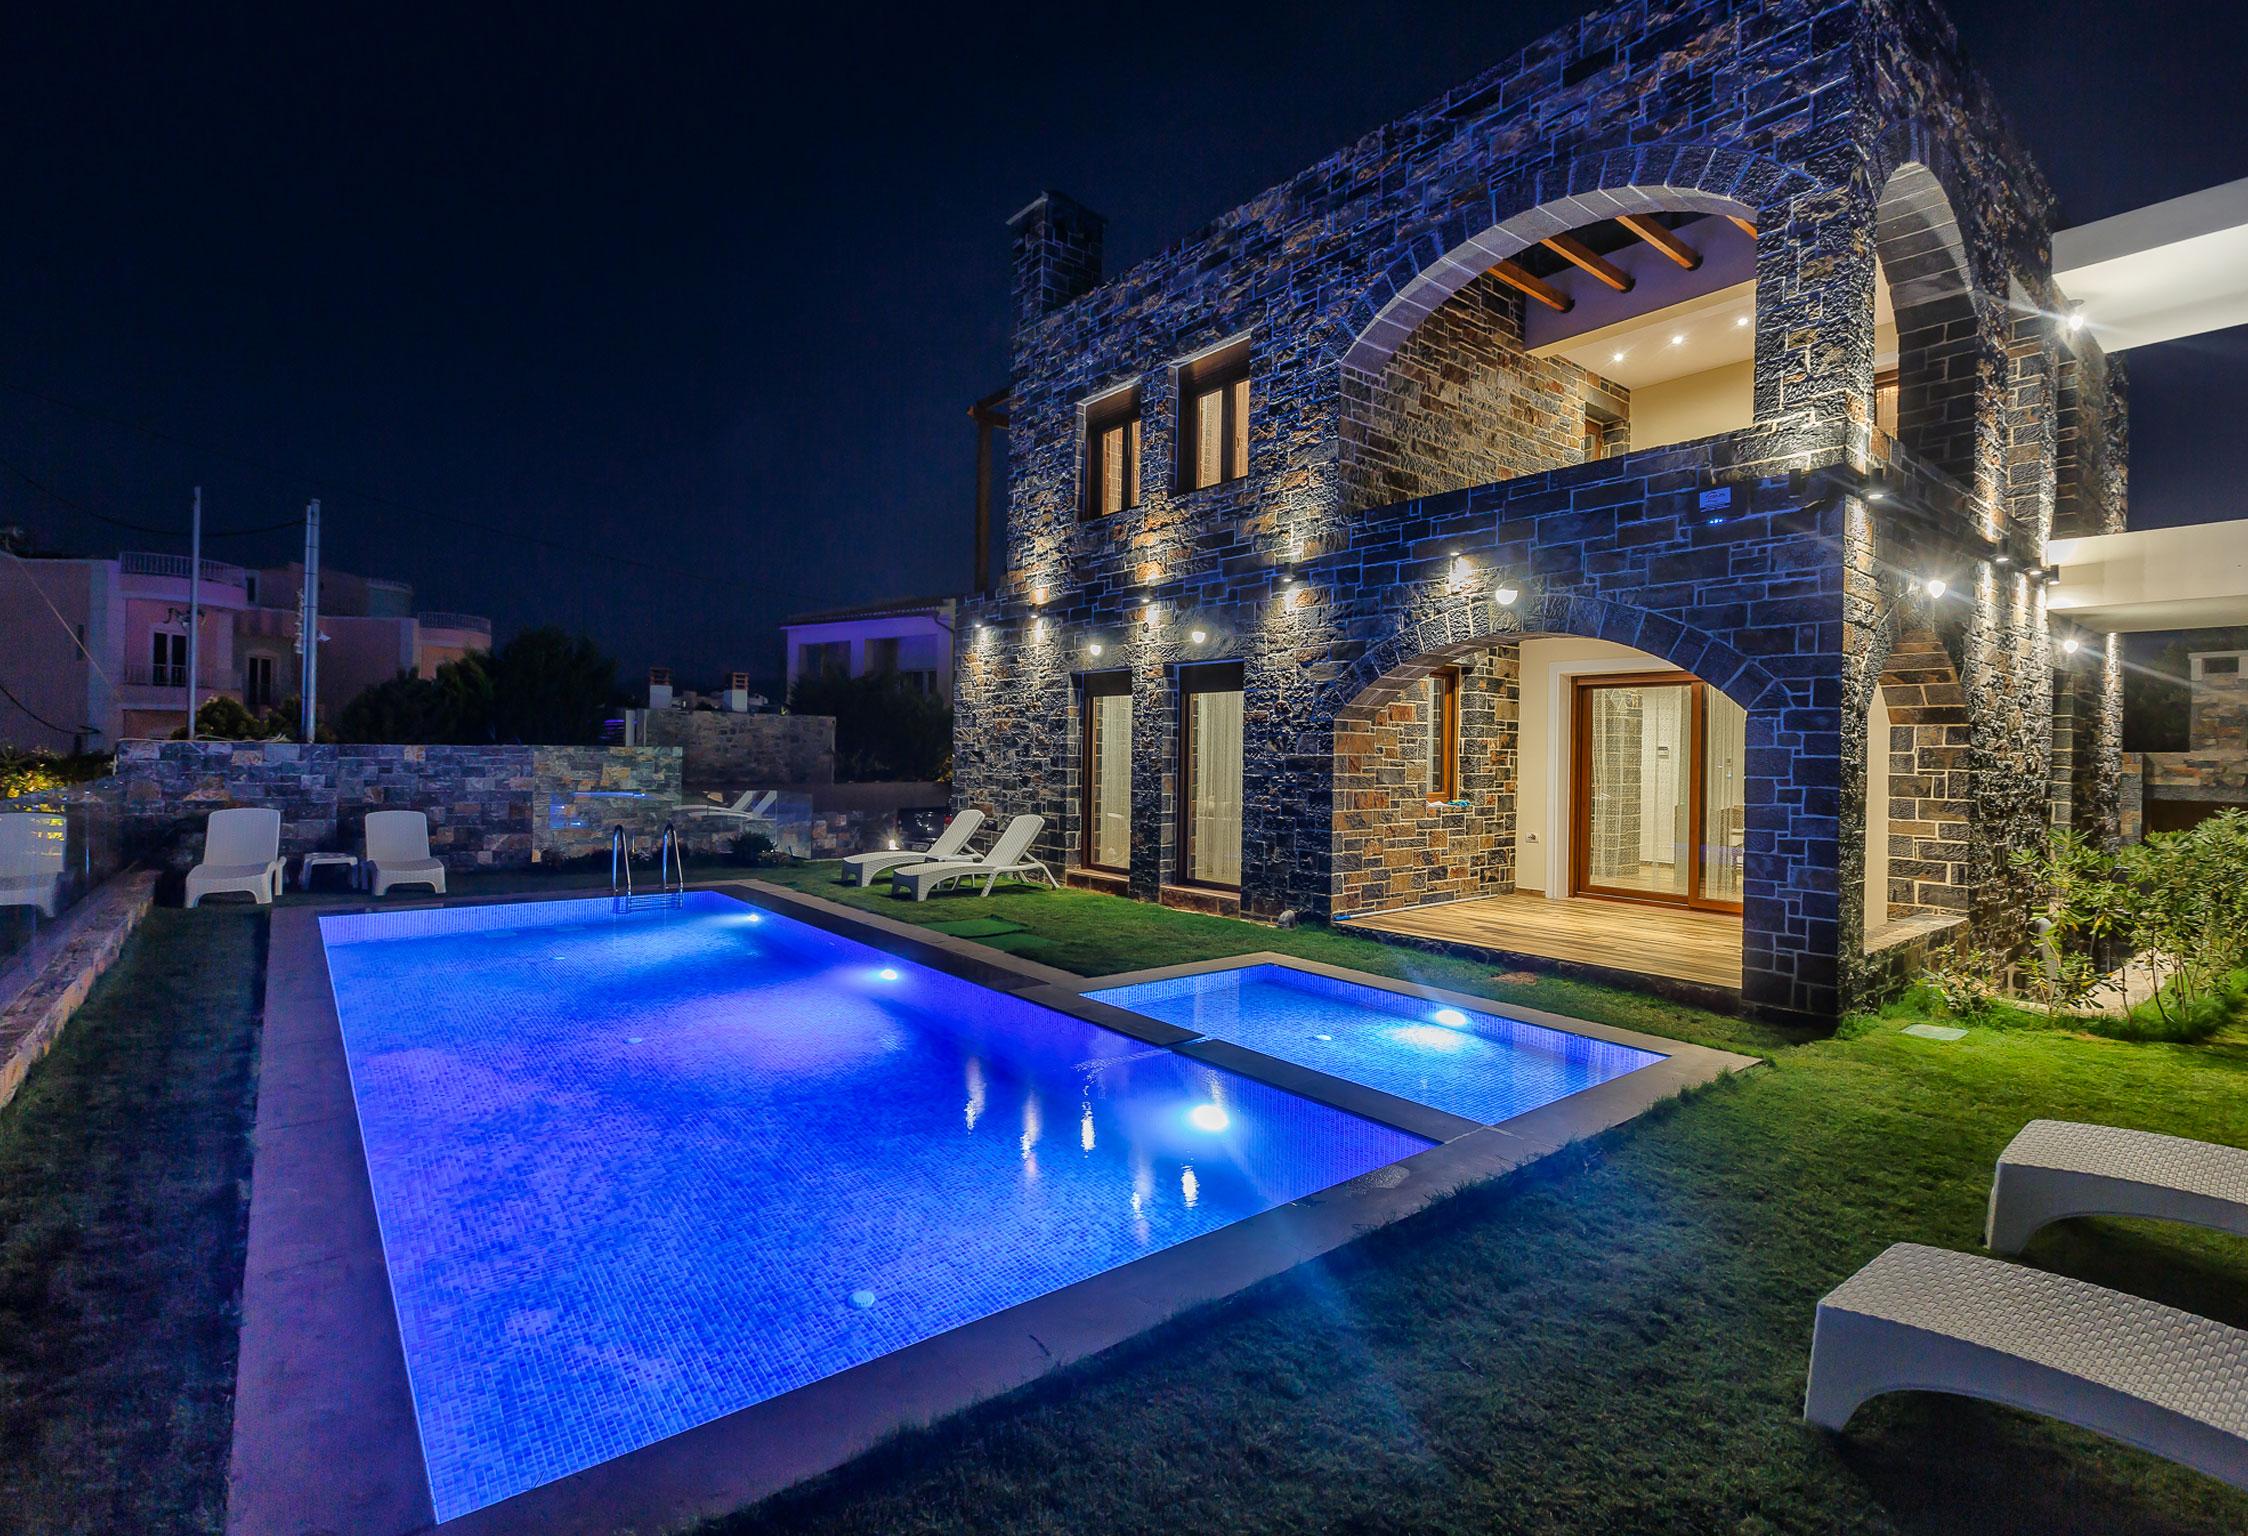 Crete Villa Genesis jumbotron image